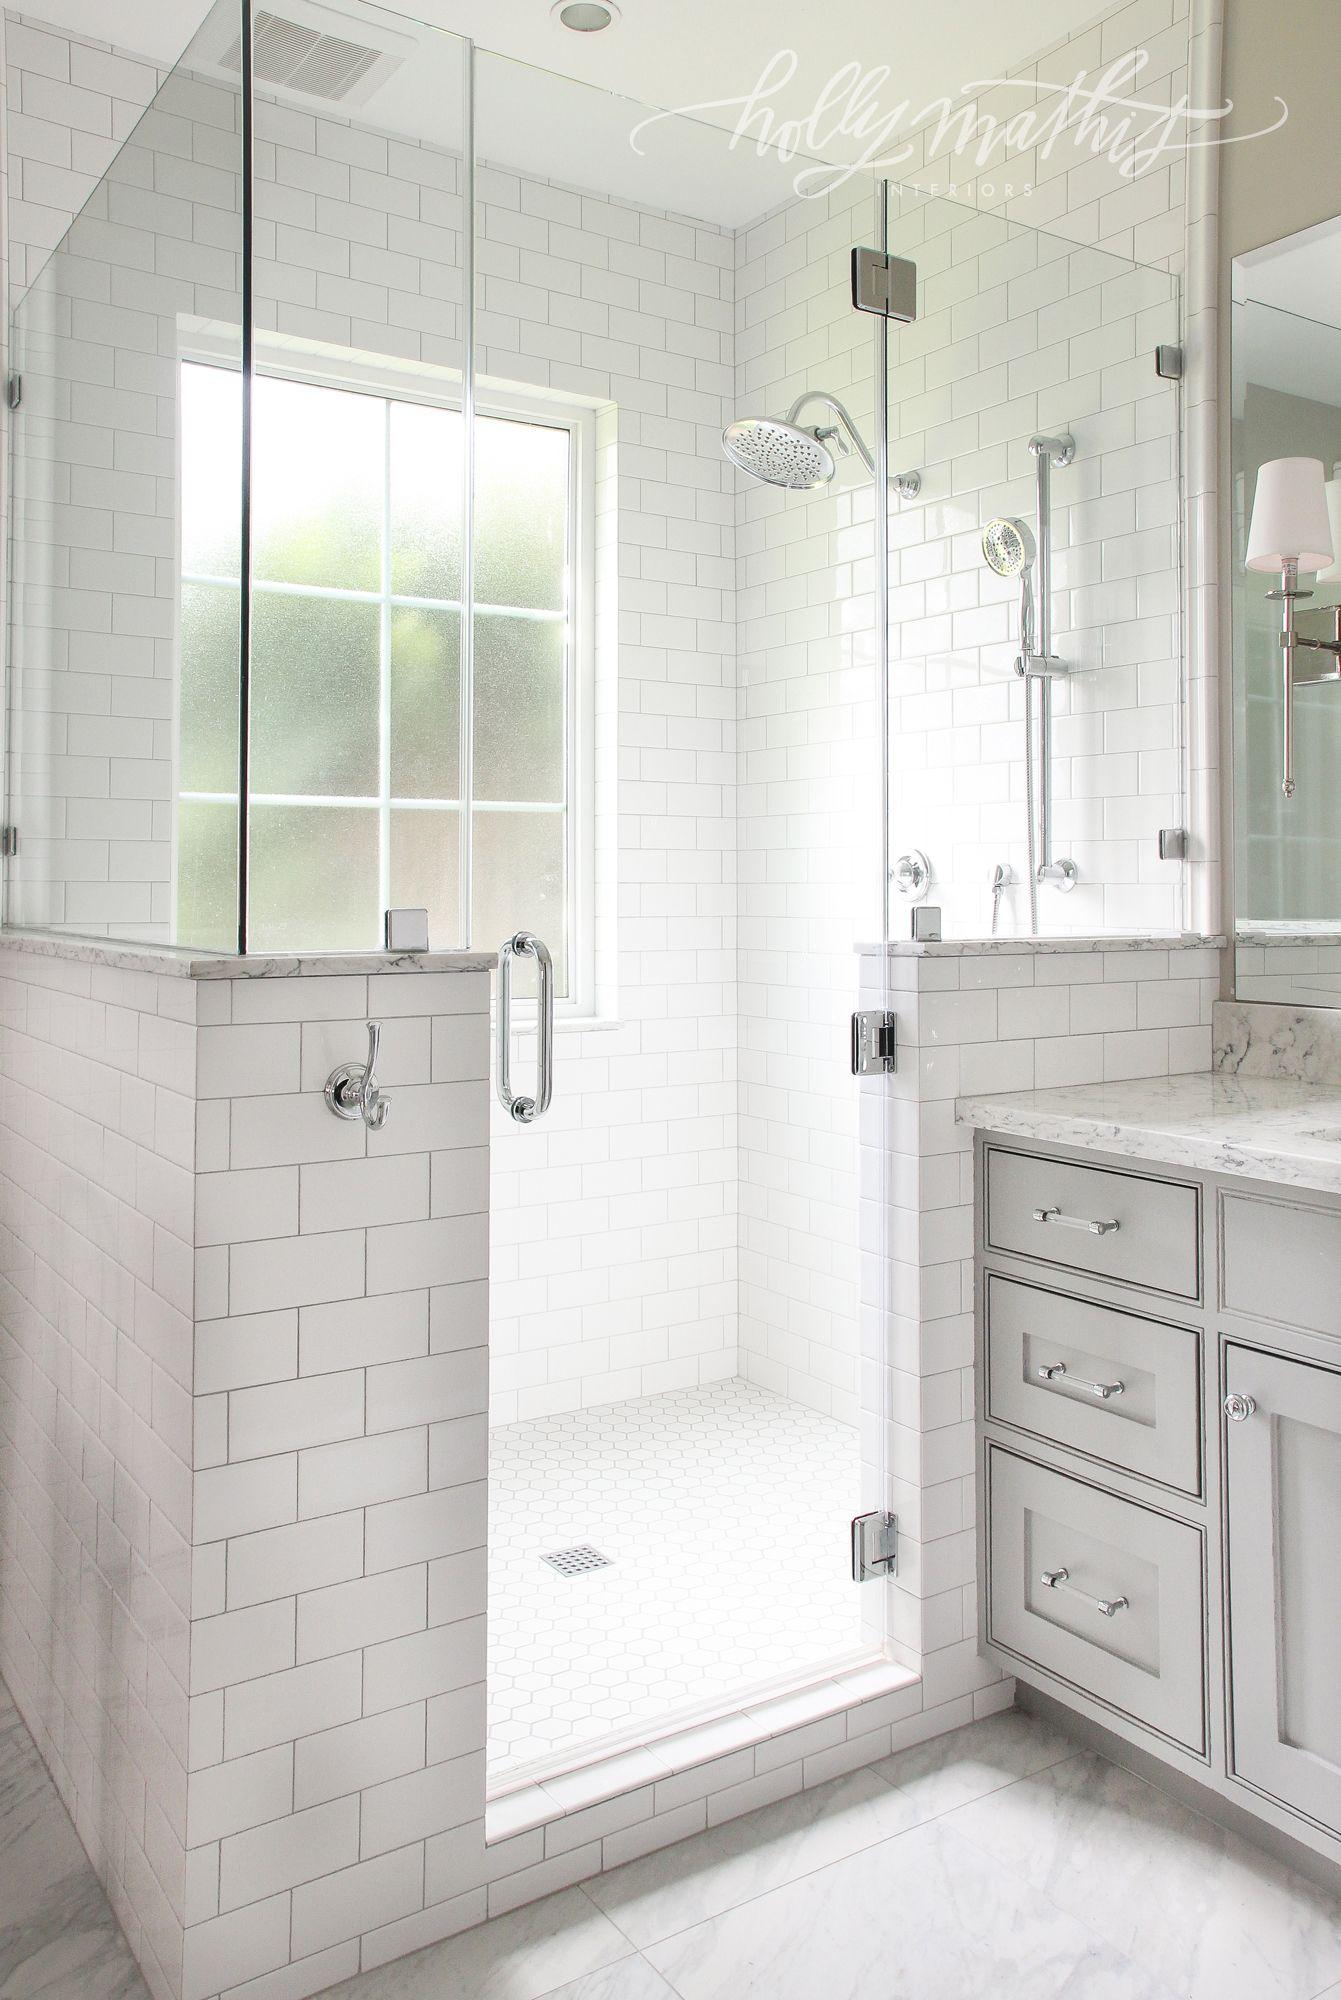 window in shower, half wall, frameless shower door. Holly